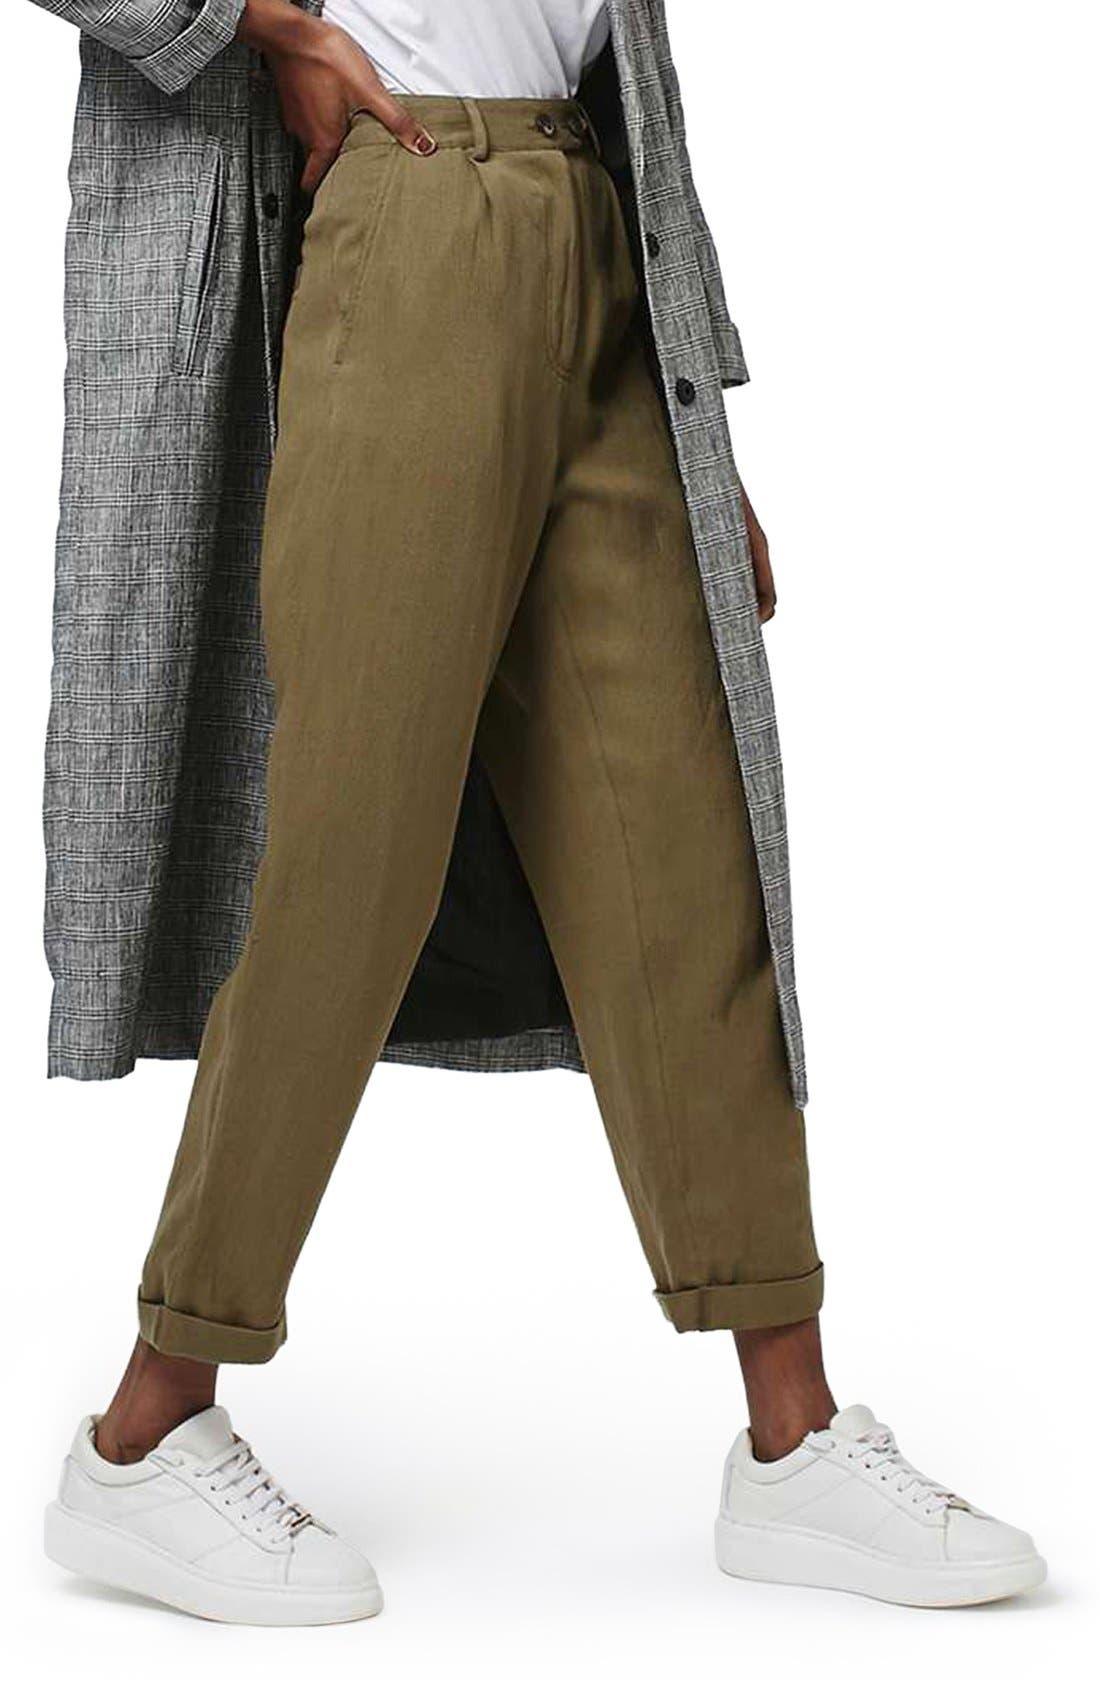 Alternate Image 1 Selected - Topshop 'Mensy' Corduroy Peg Trousers